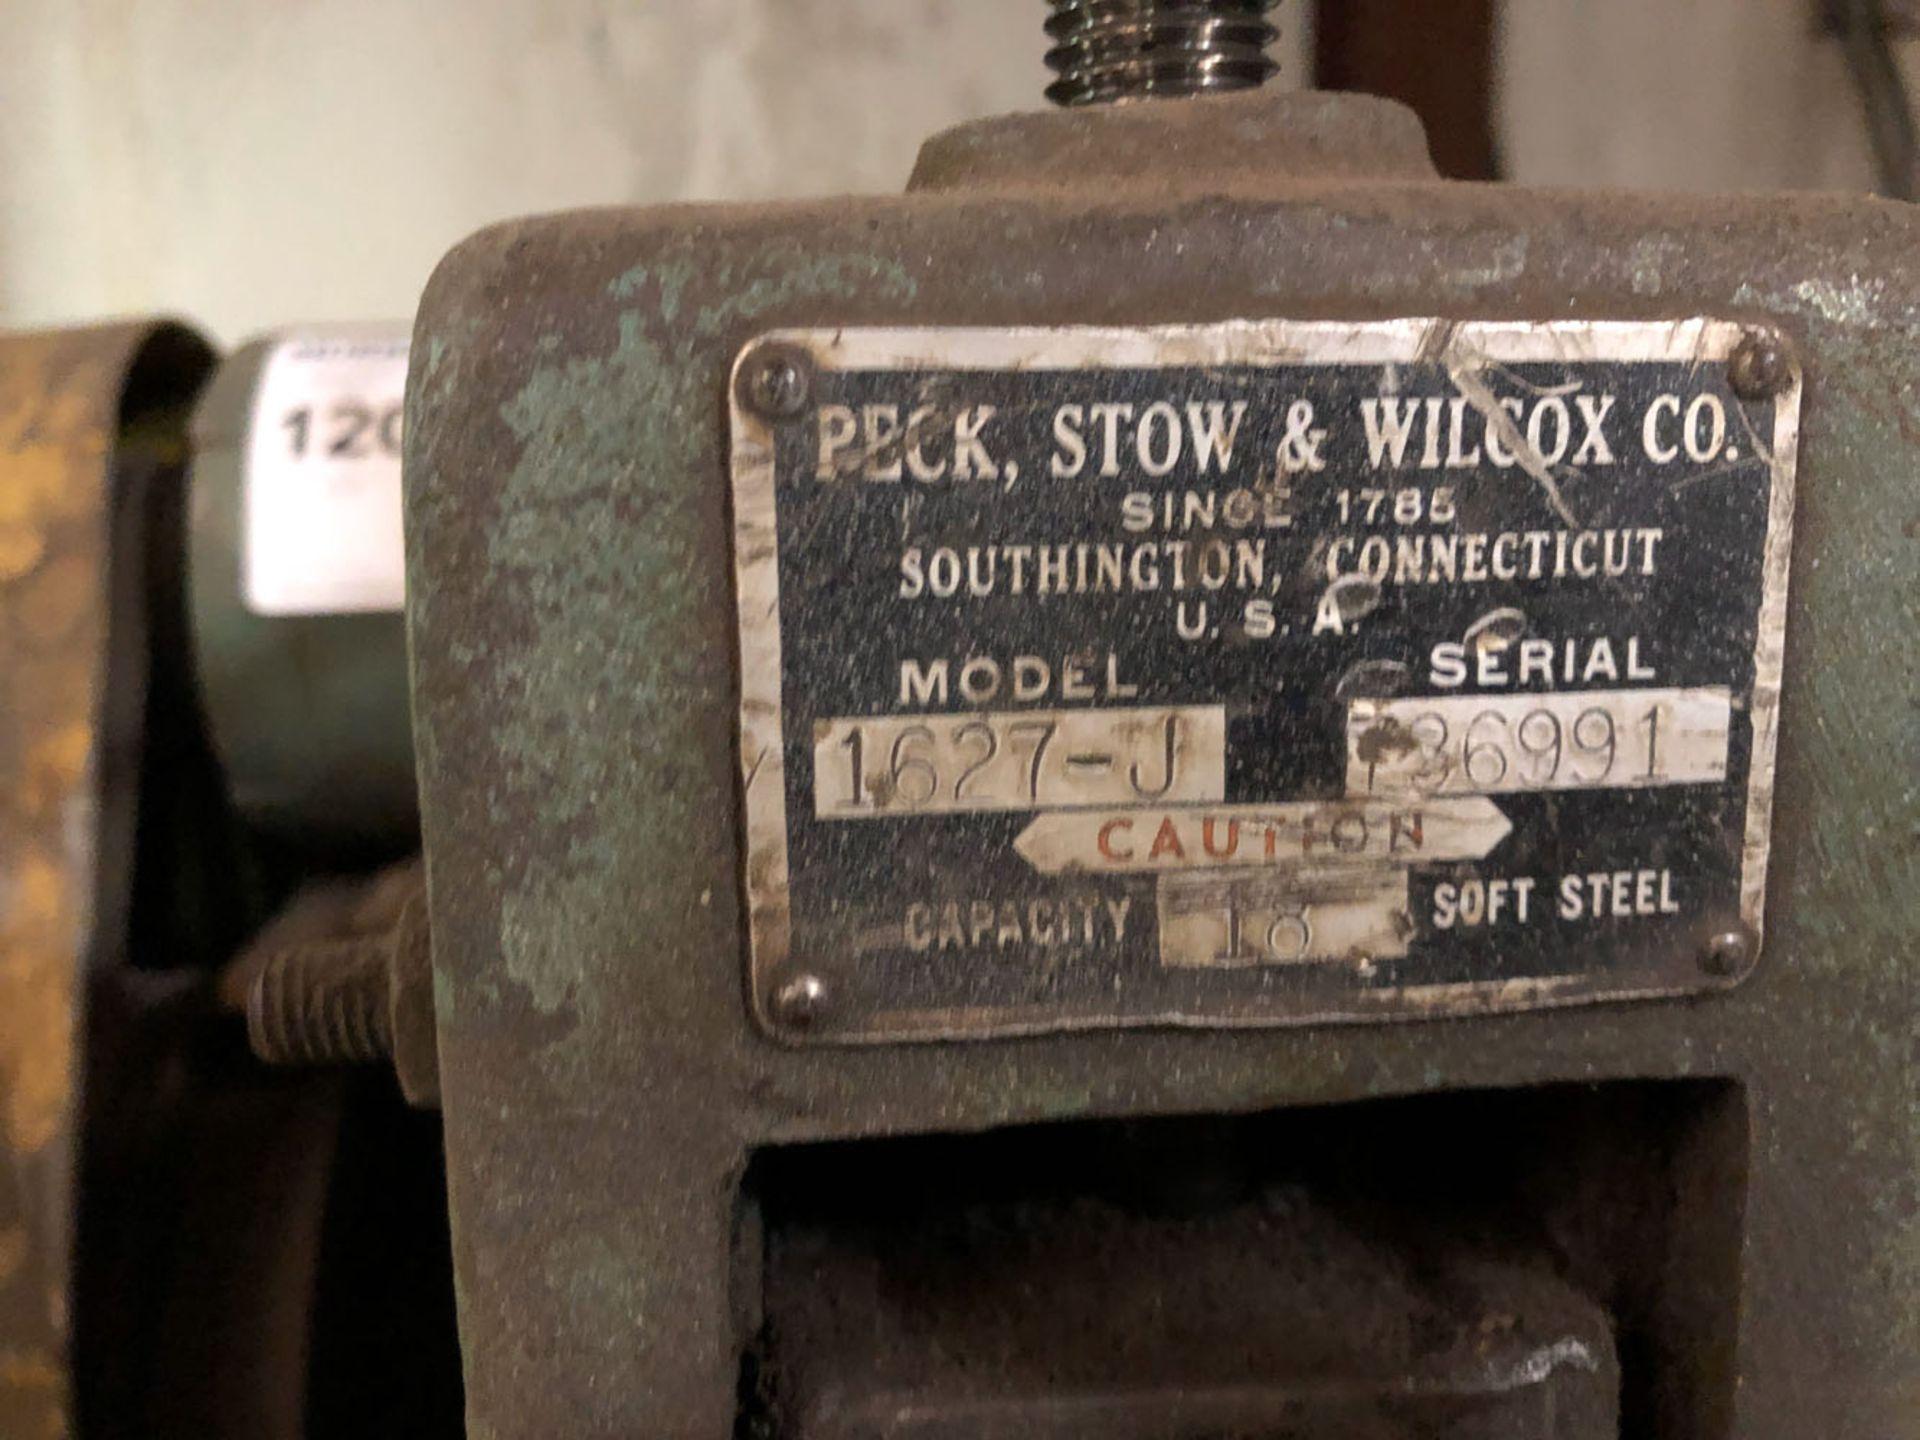 Lot 120 - Crimper, Peck Stow & Wilcox Model 1627-J Ser.No. 736991